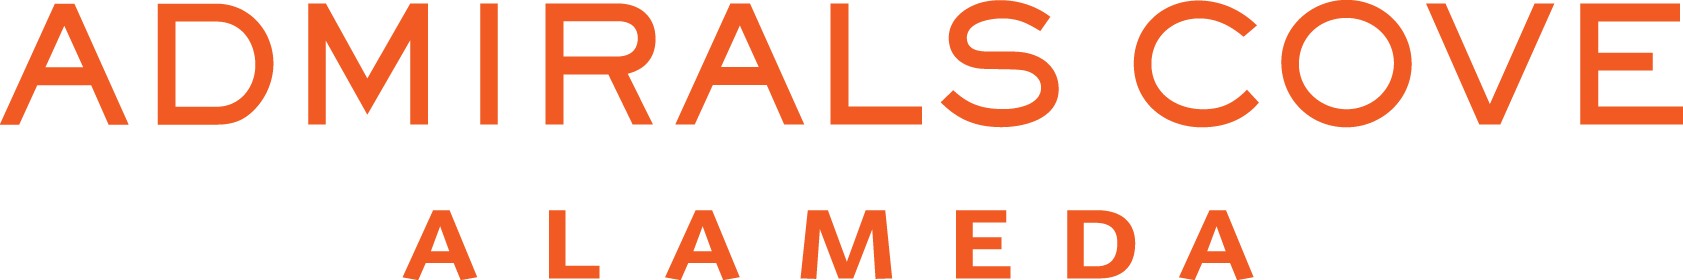 AdmiralsCove_Logo_Primary_CMYK